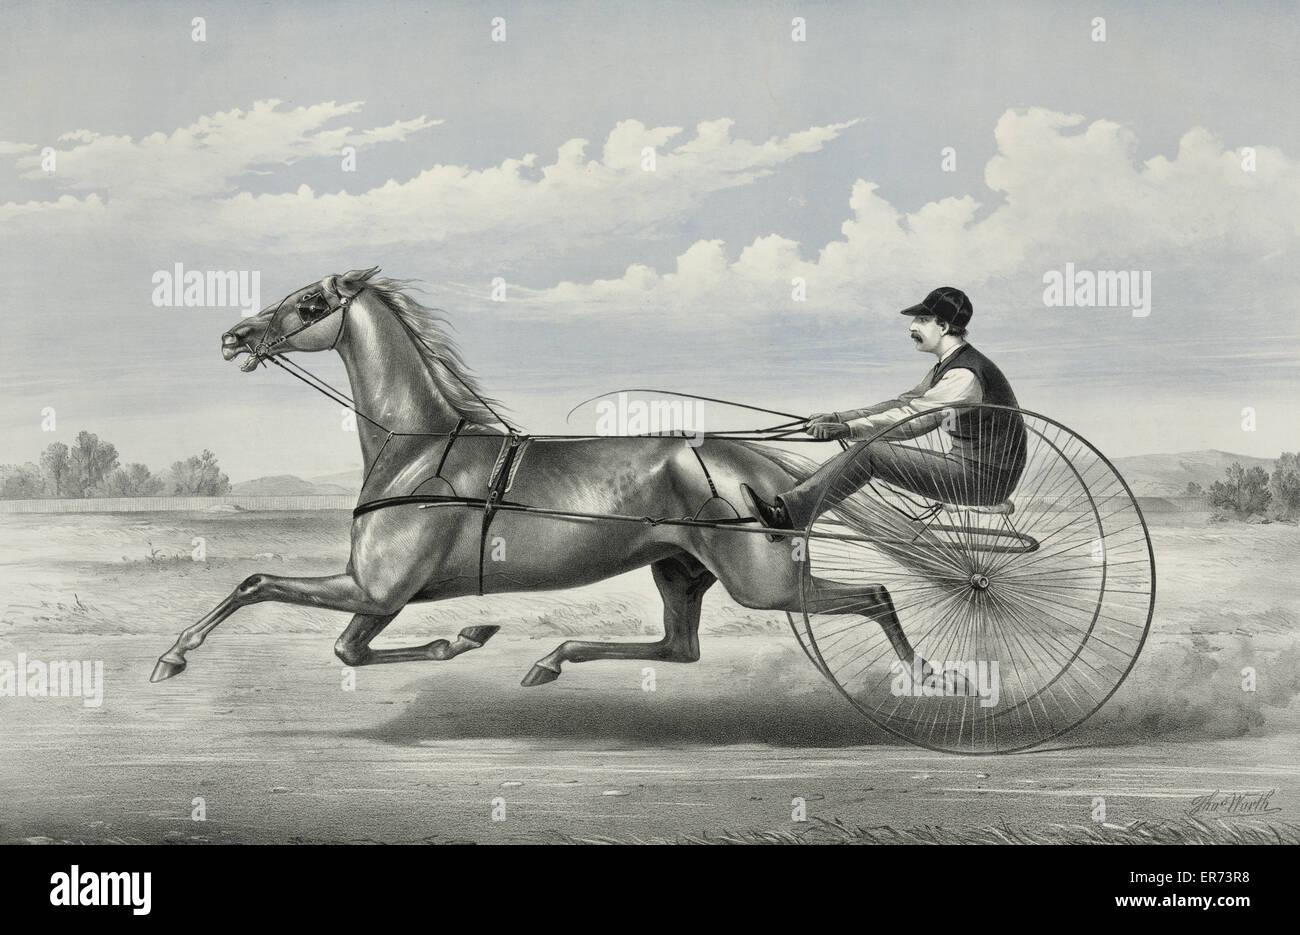 Hopeful: grey gelding by Godfrey's Patchen, dam unknown. Date c1876. - Stock Image